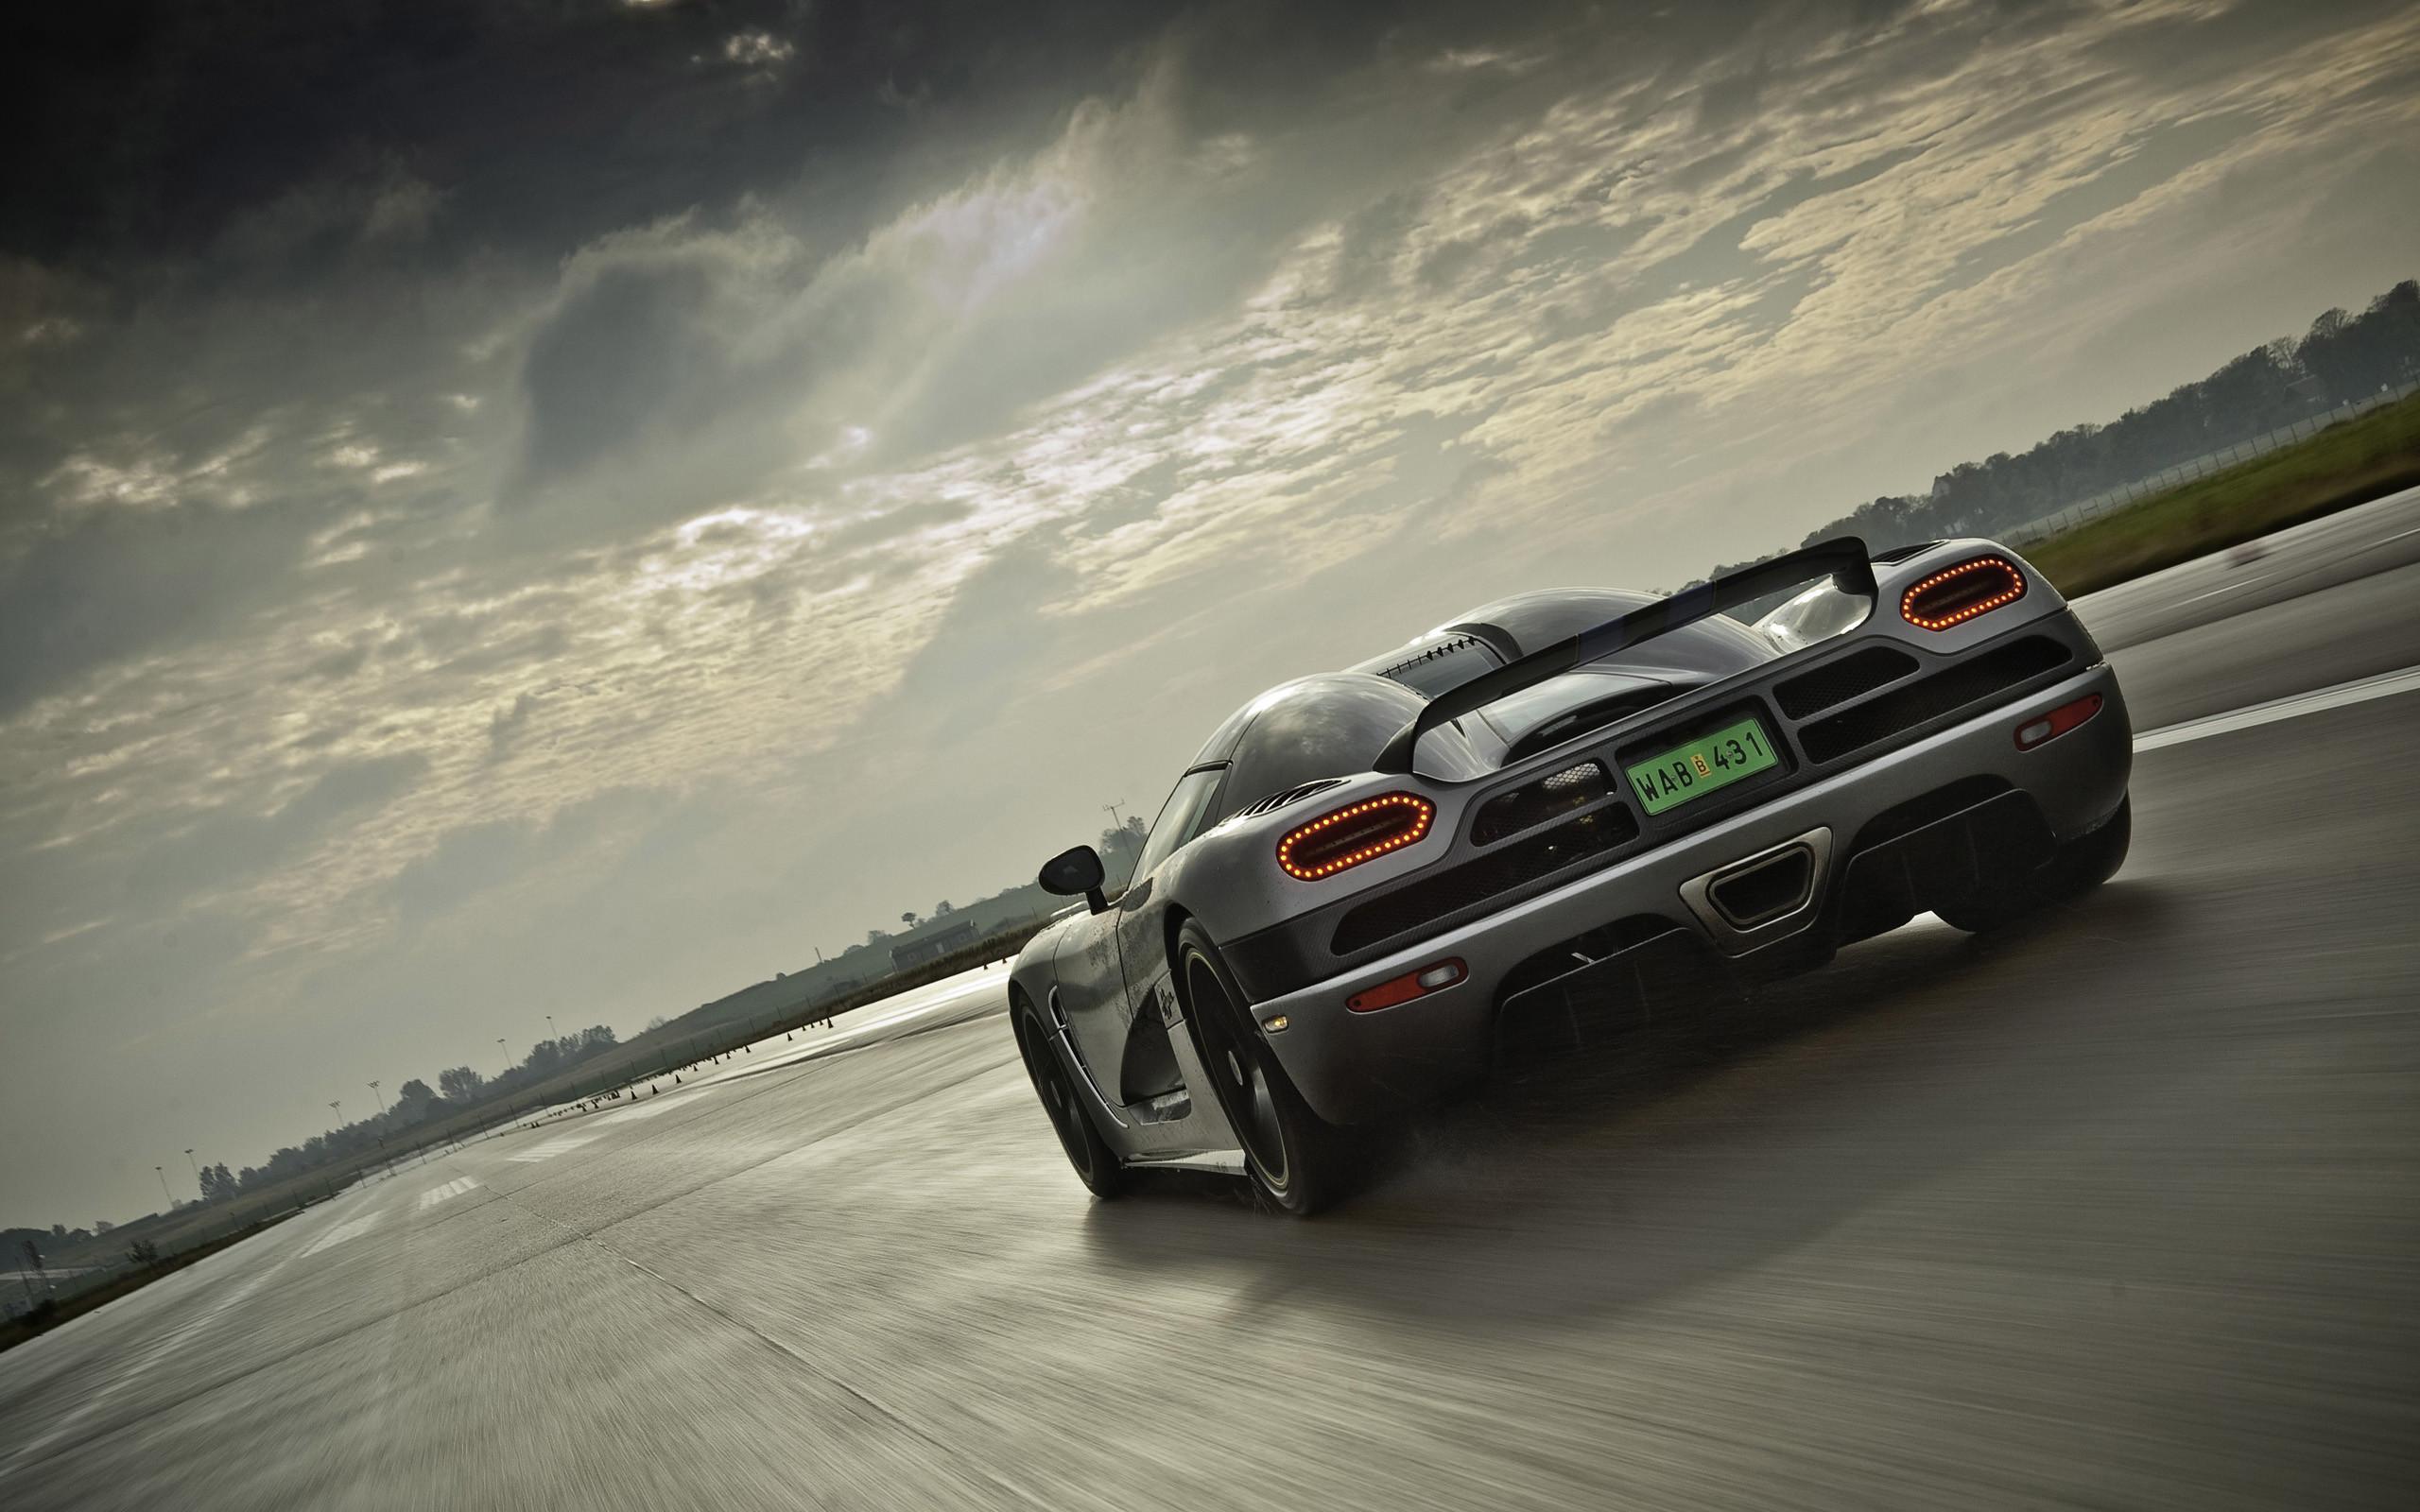 wallpaper.wiki-Koenigsegg-Agera-R-Background-2560×1600-PIC-